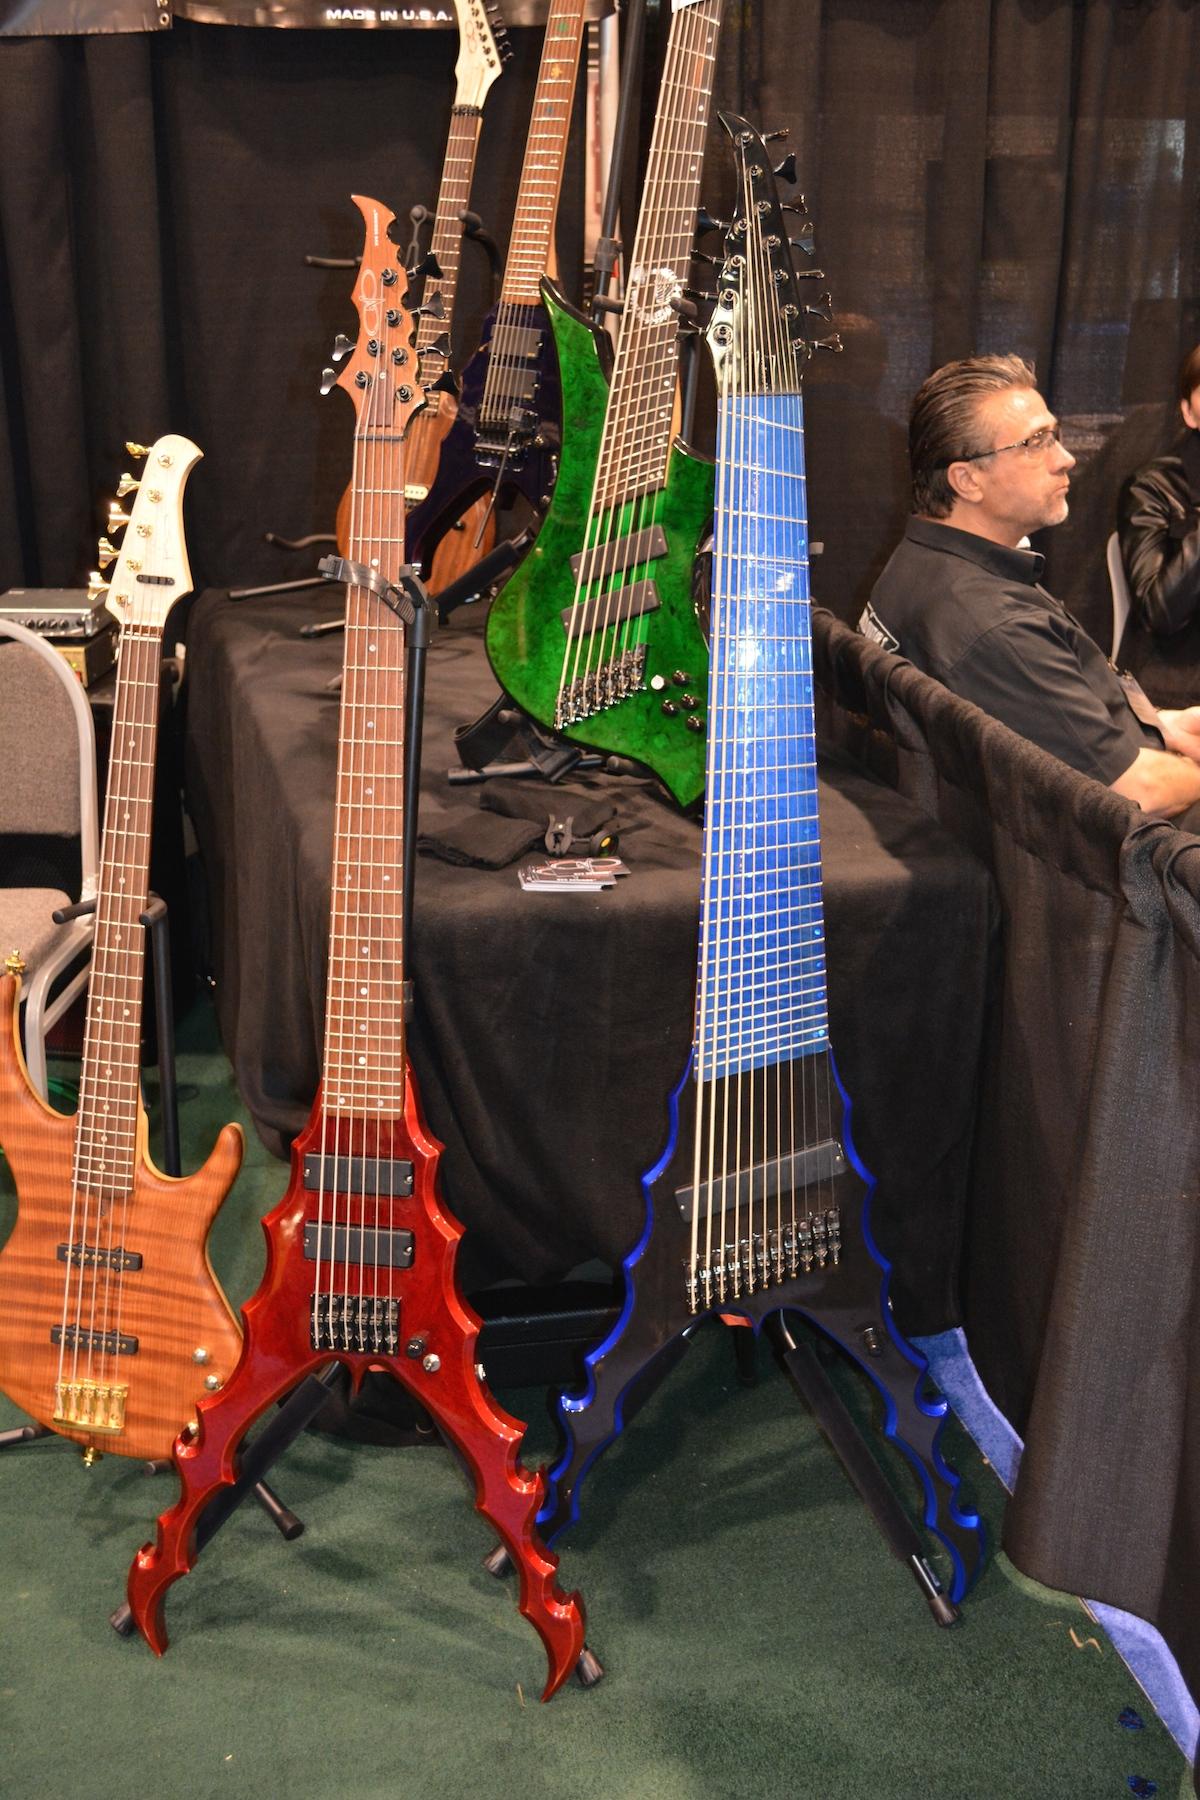 11-String ERB Bass, anyone? by SVS Designs, NAMM 2015. ©WoTR Radio